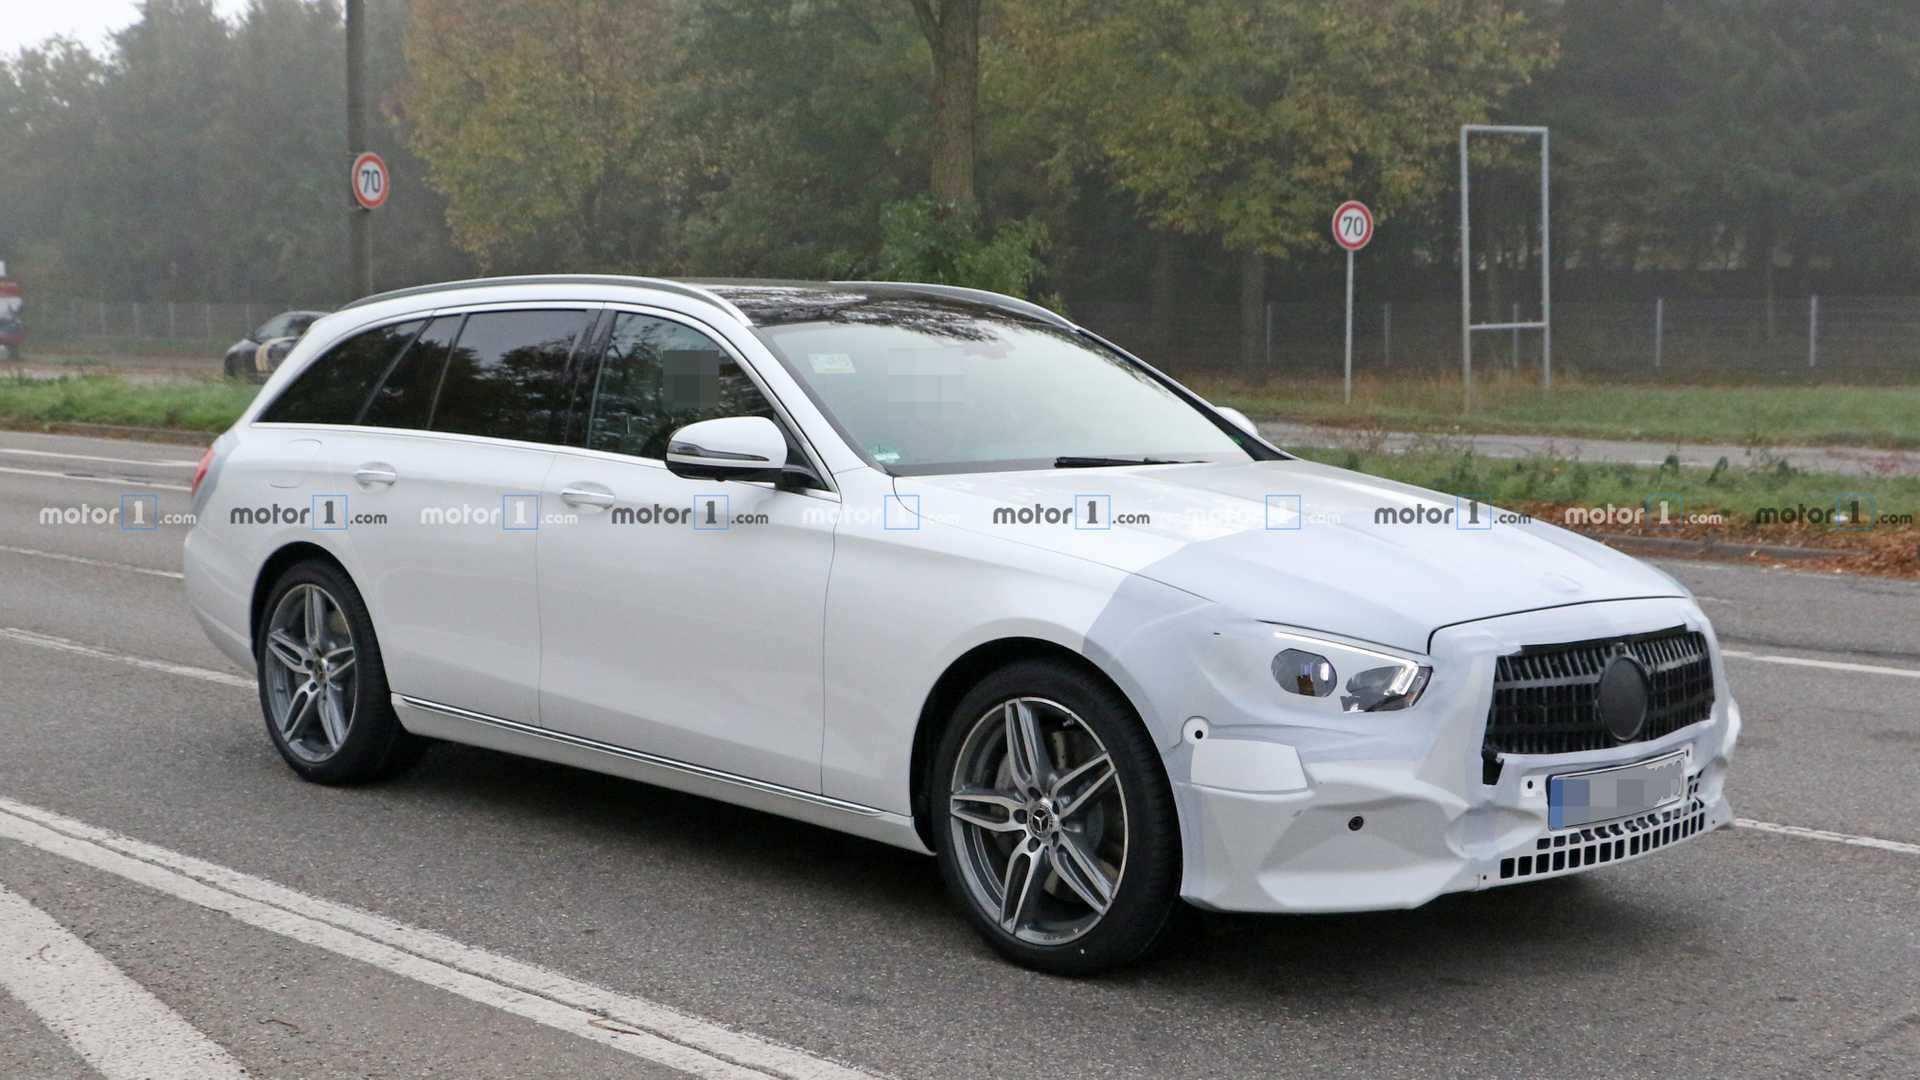 29 Great Mercedes A Class 2020 Exterior Date New Concept by Mercedes A Class 2020 Exterior Date